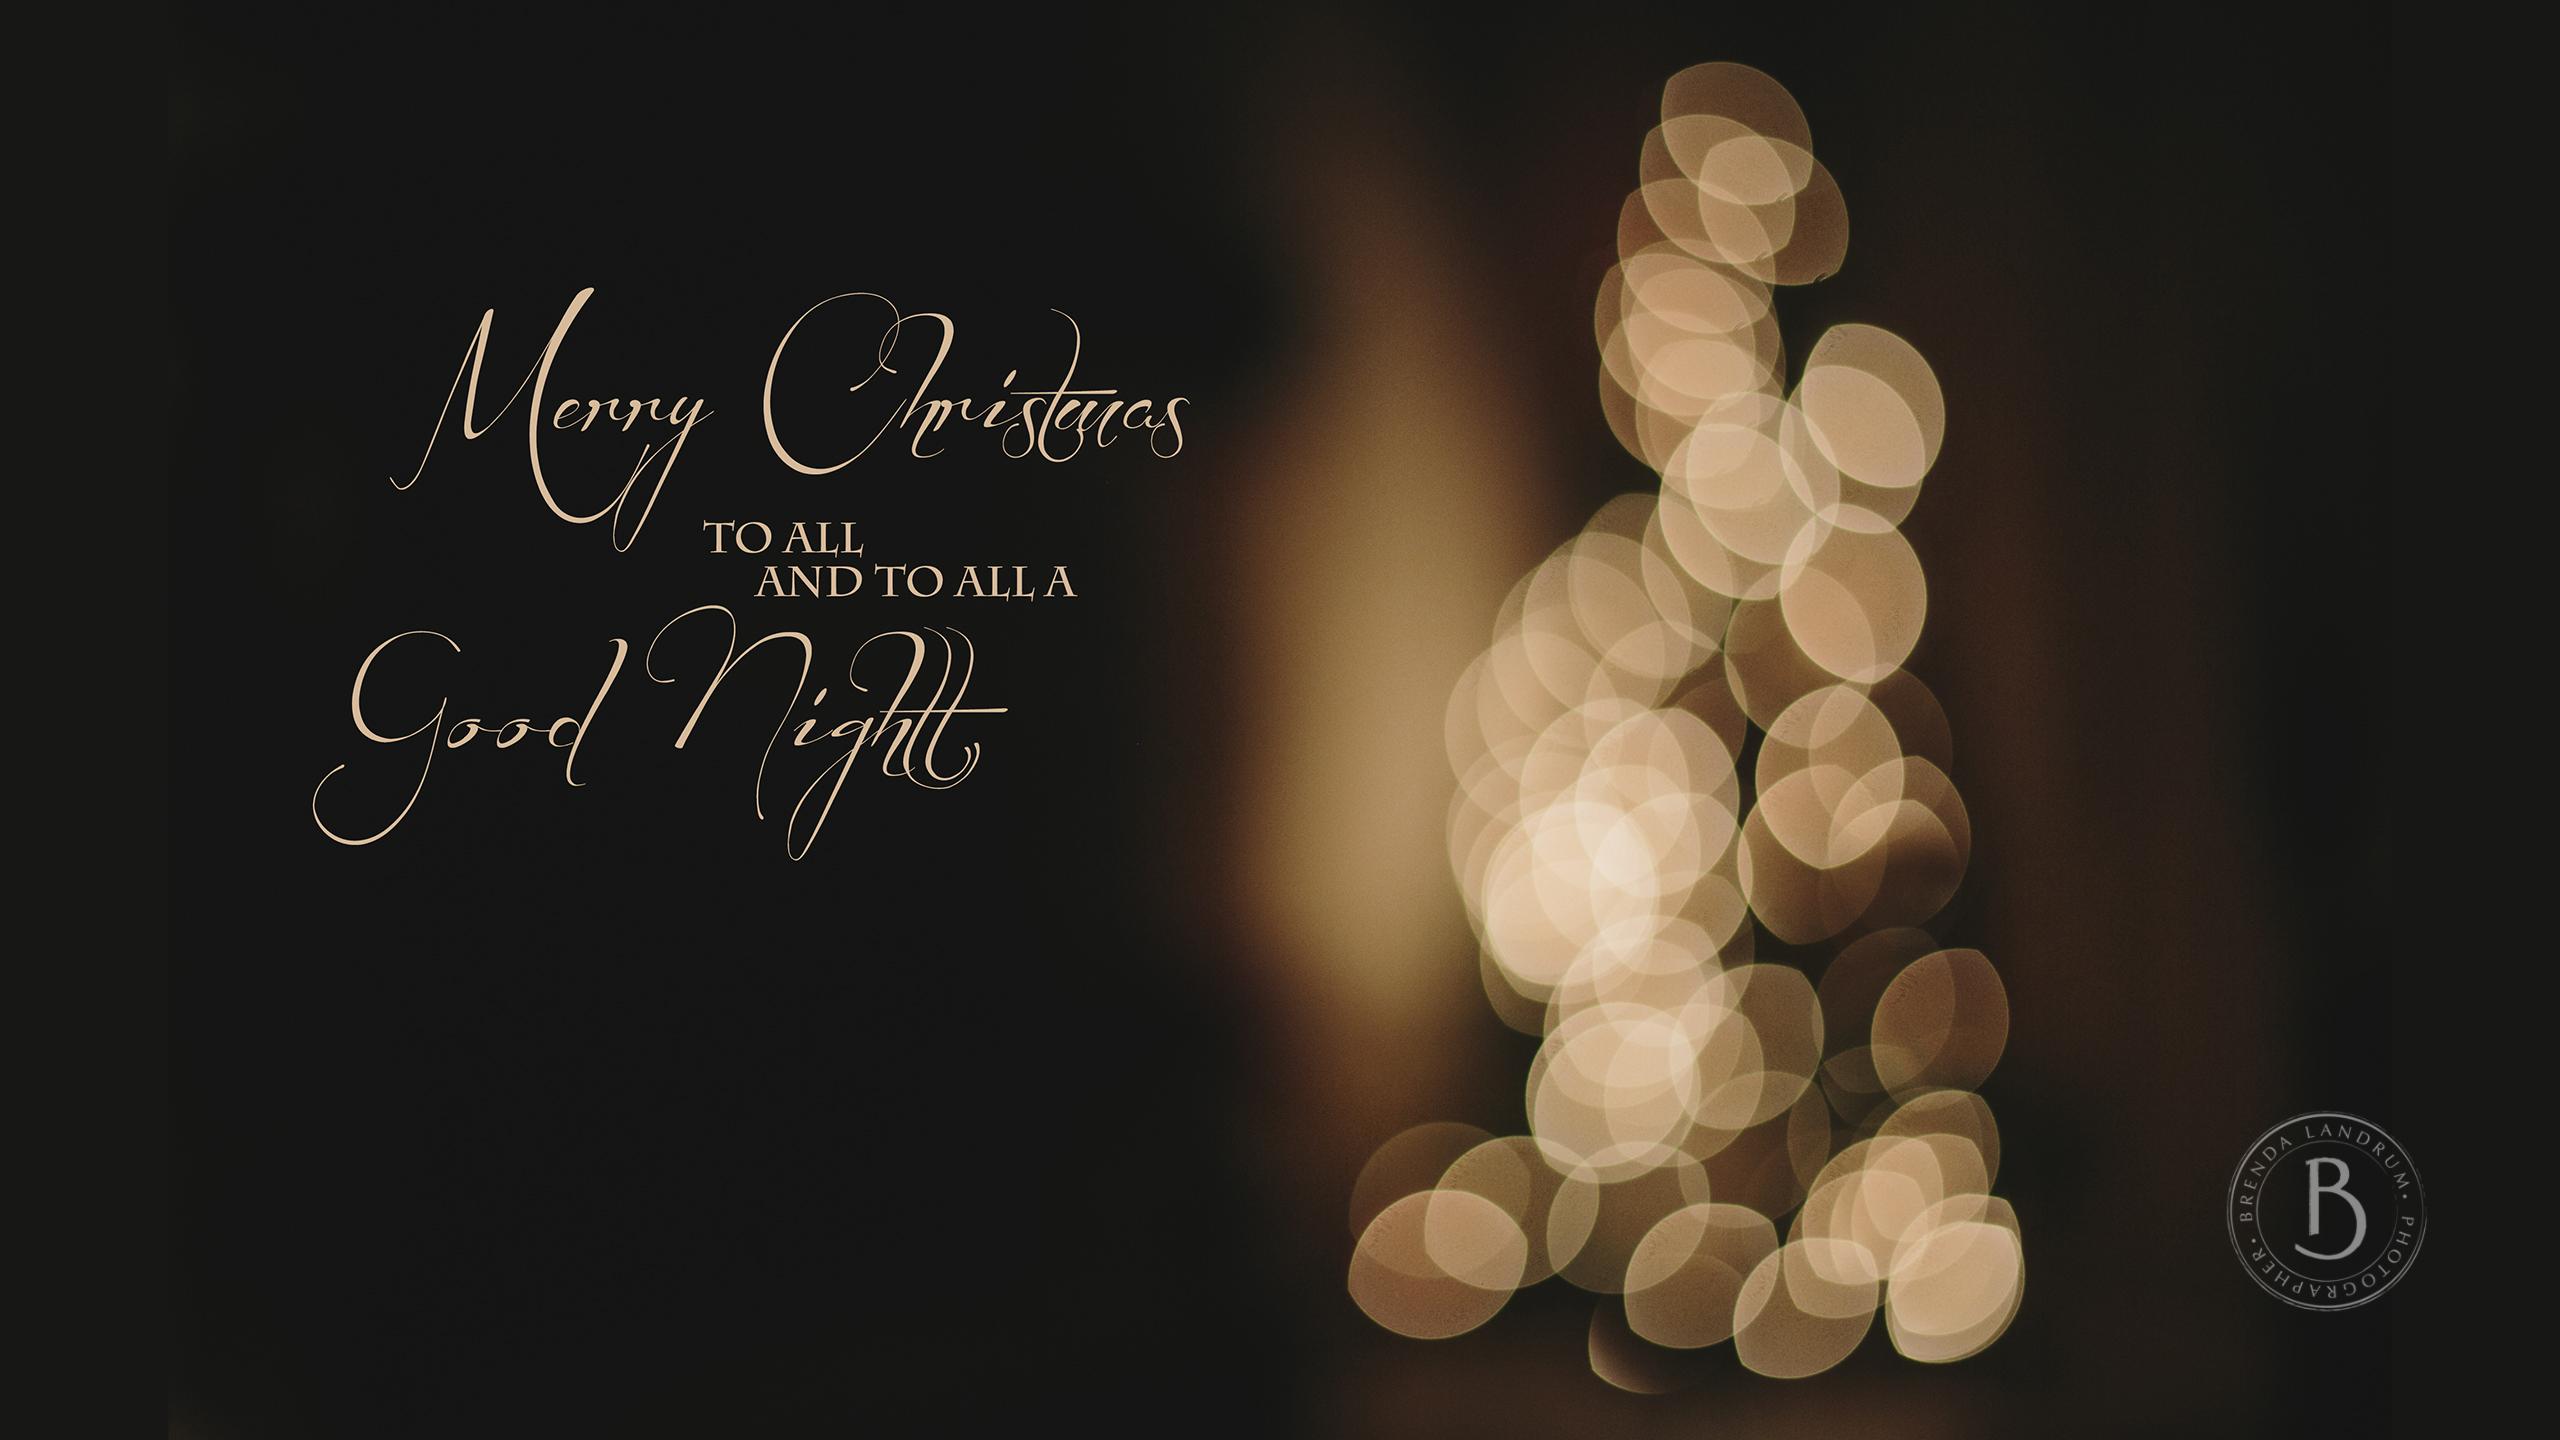 2012 December Free Wallpaper for Desktop iPhone & iPad